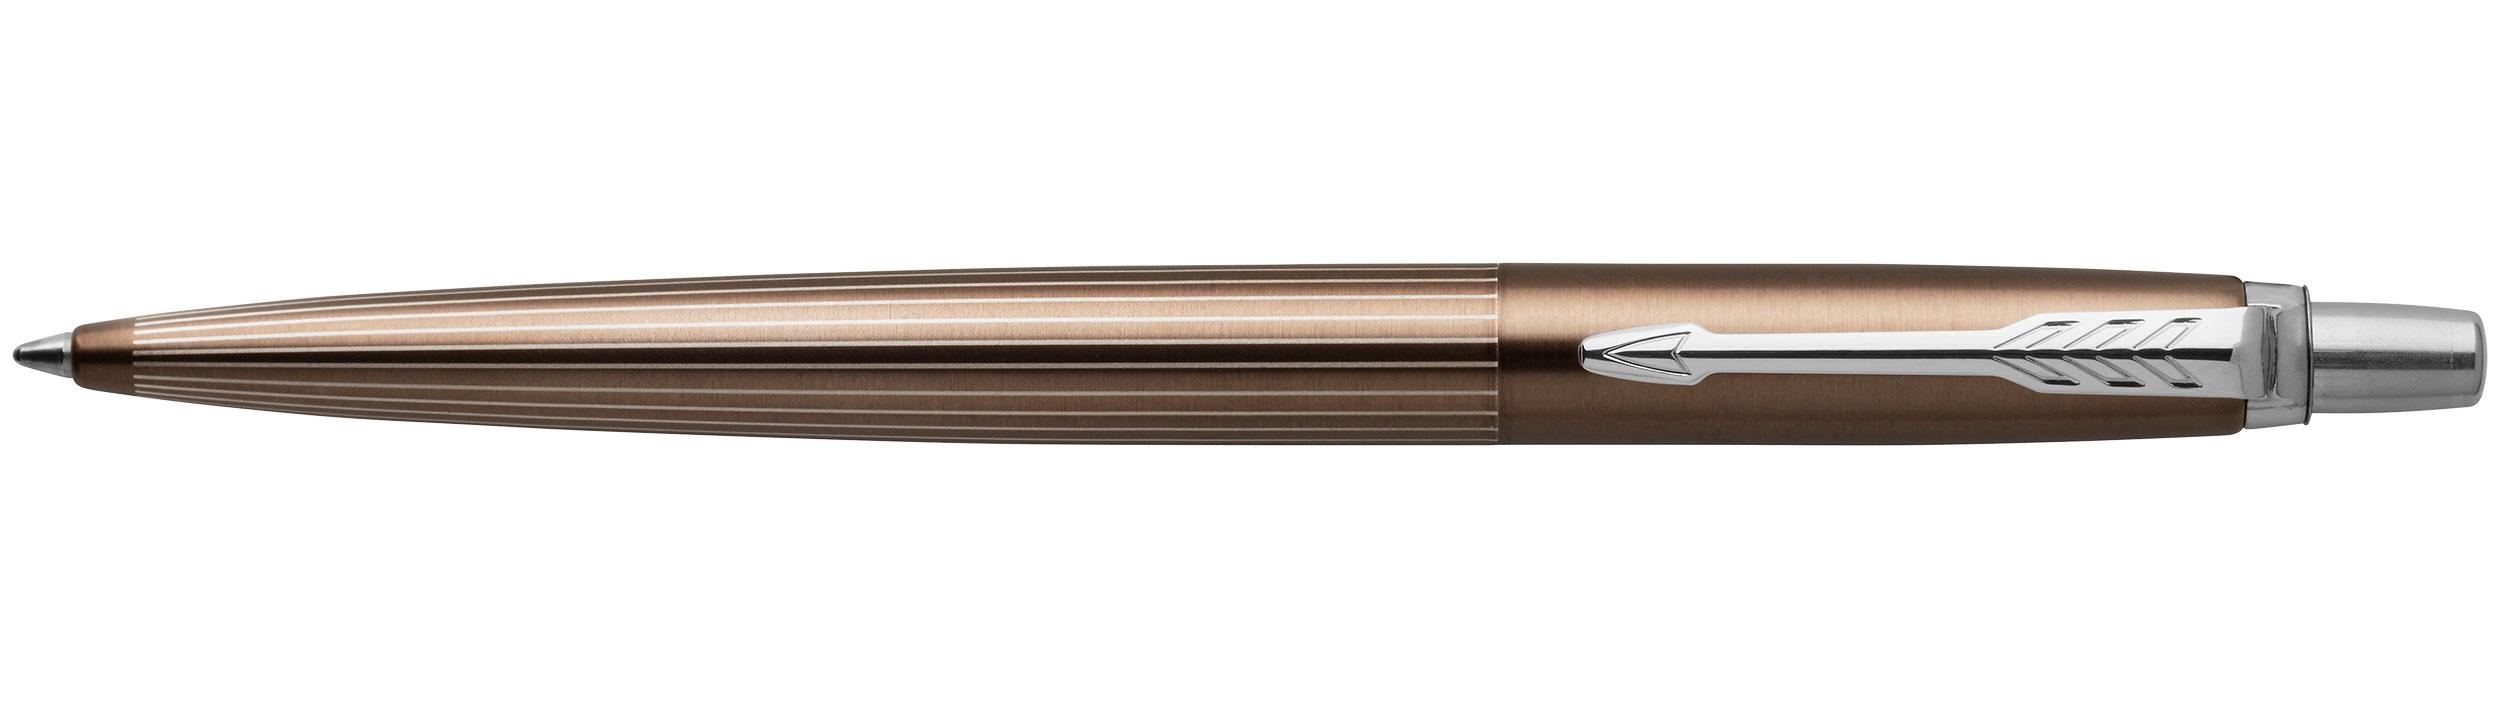 ned parkerwood brown survey - 2500×708